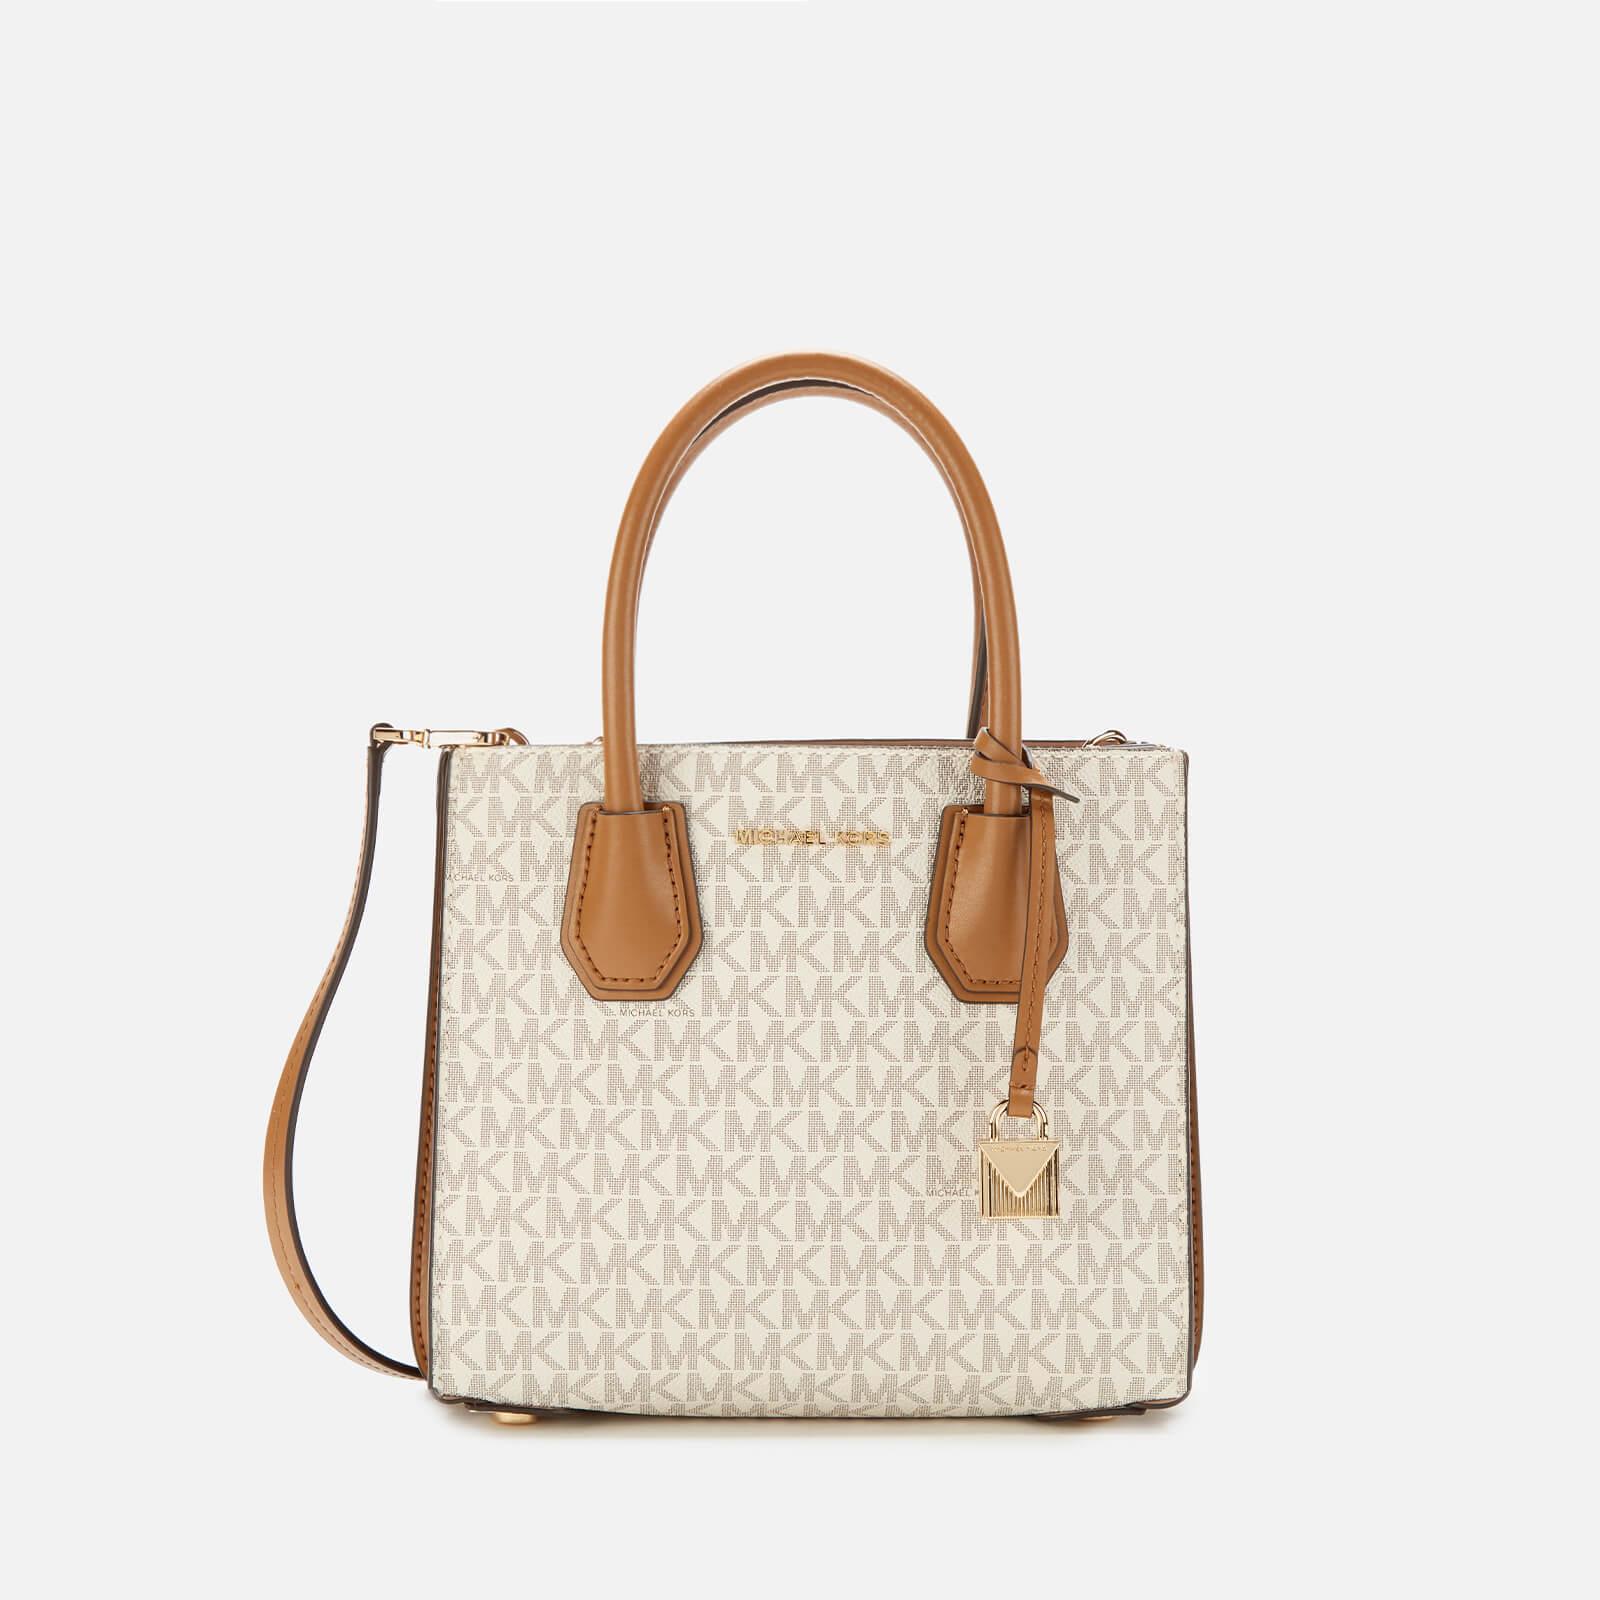 84c0d0784 MICHAEL MICHAEL KORS Women's Mercer Medium Acordian Messenger Bag - Vanilla